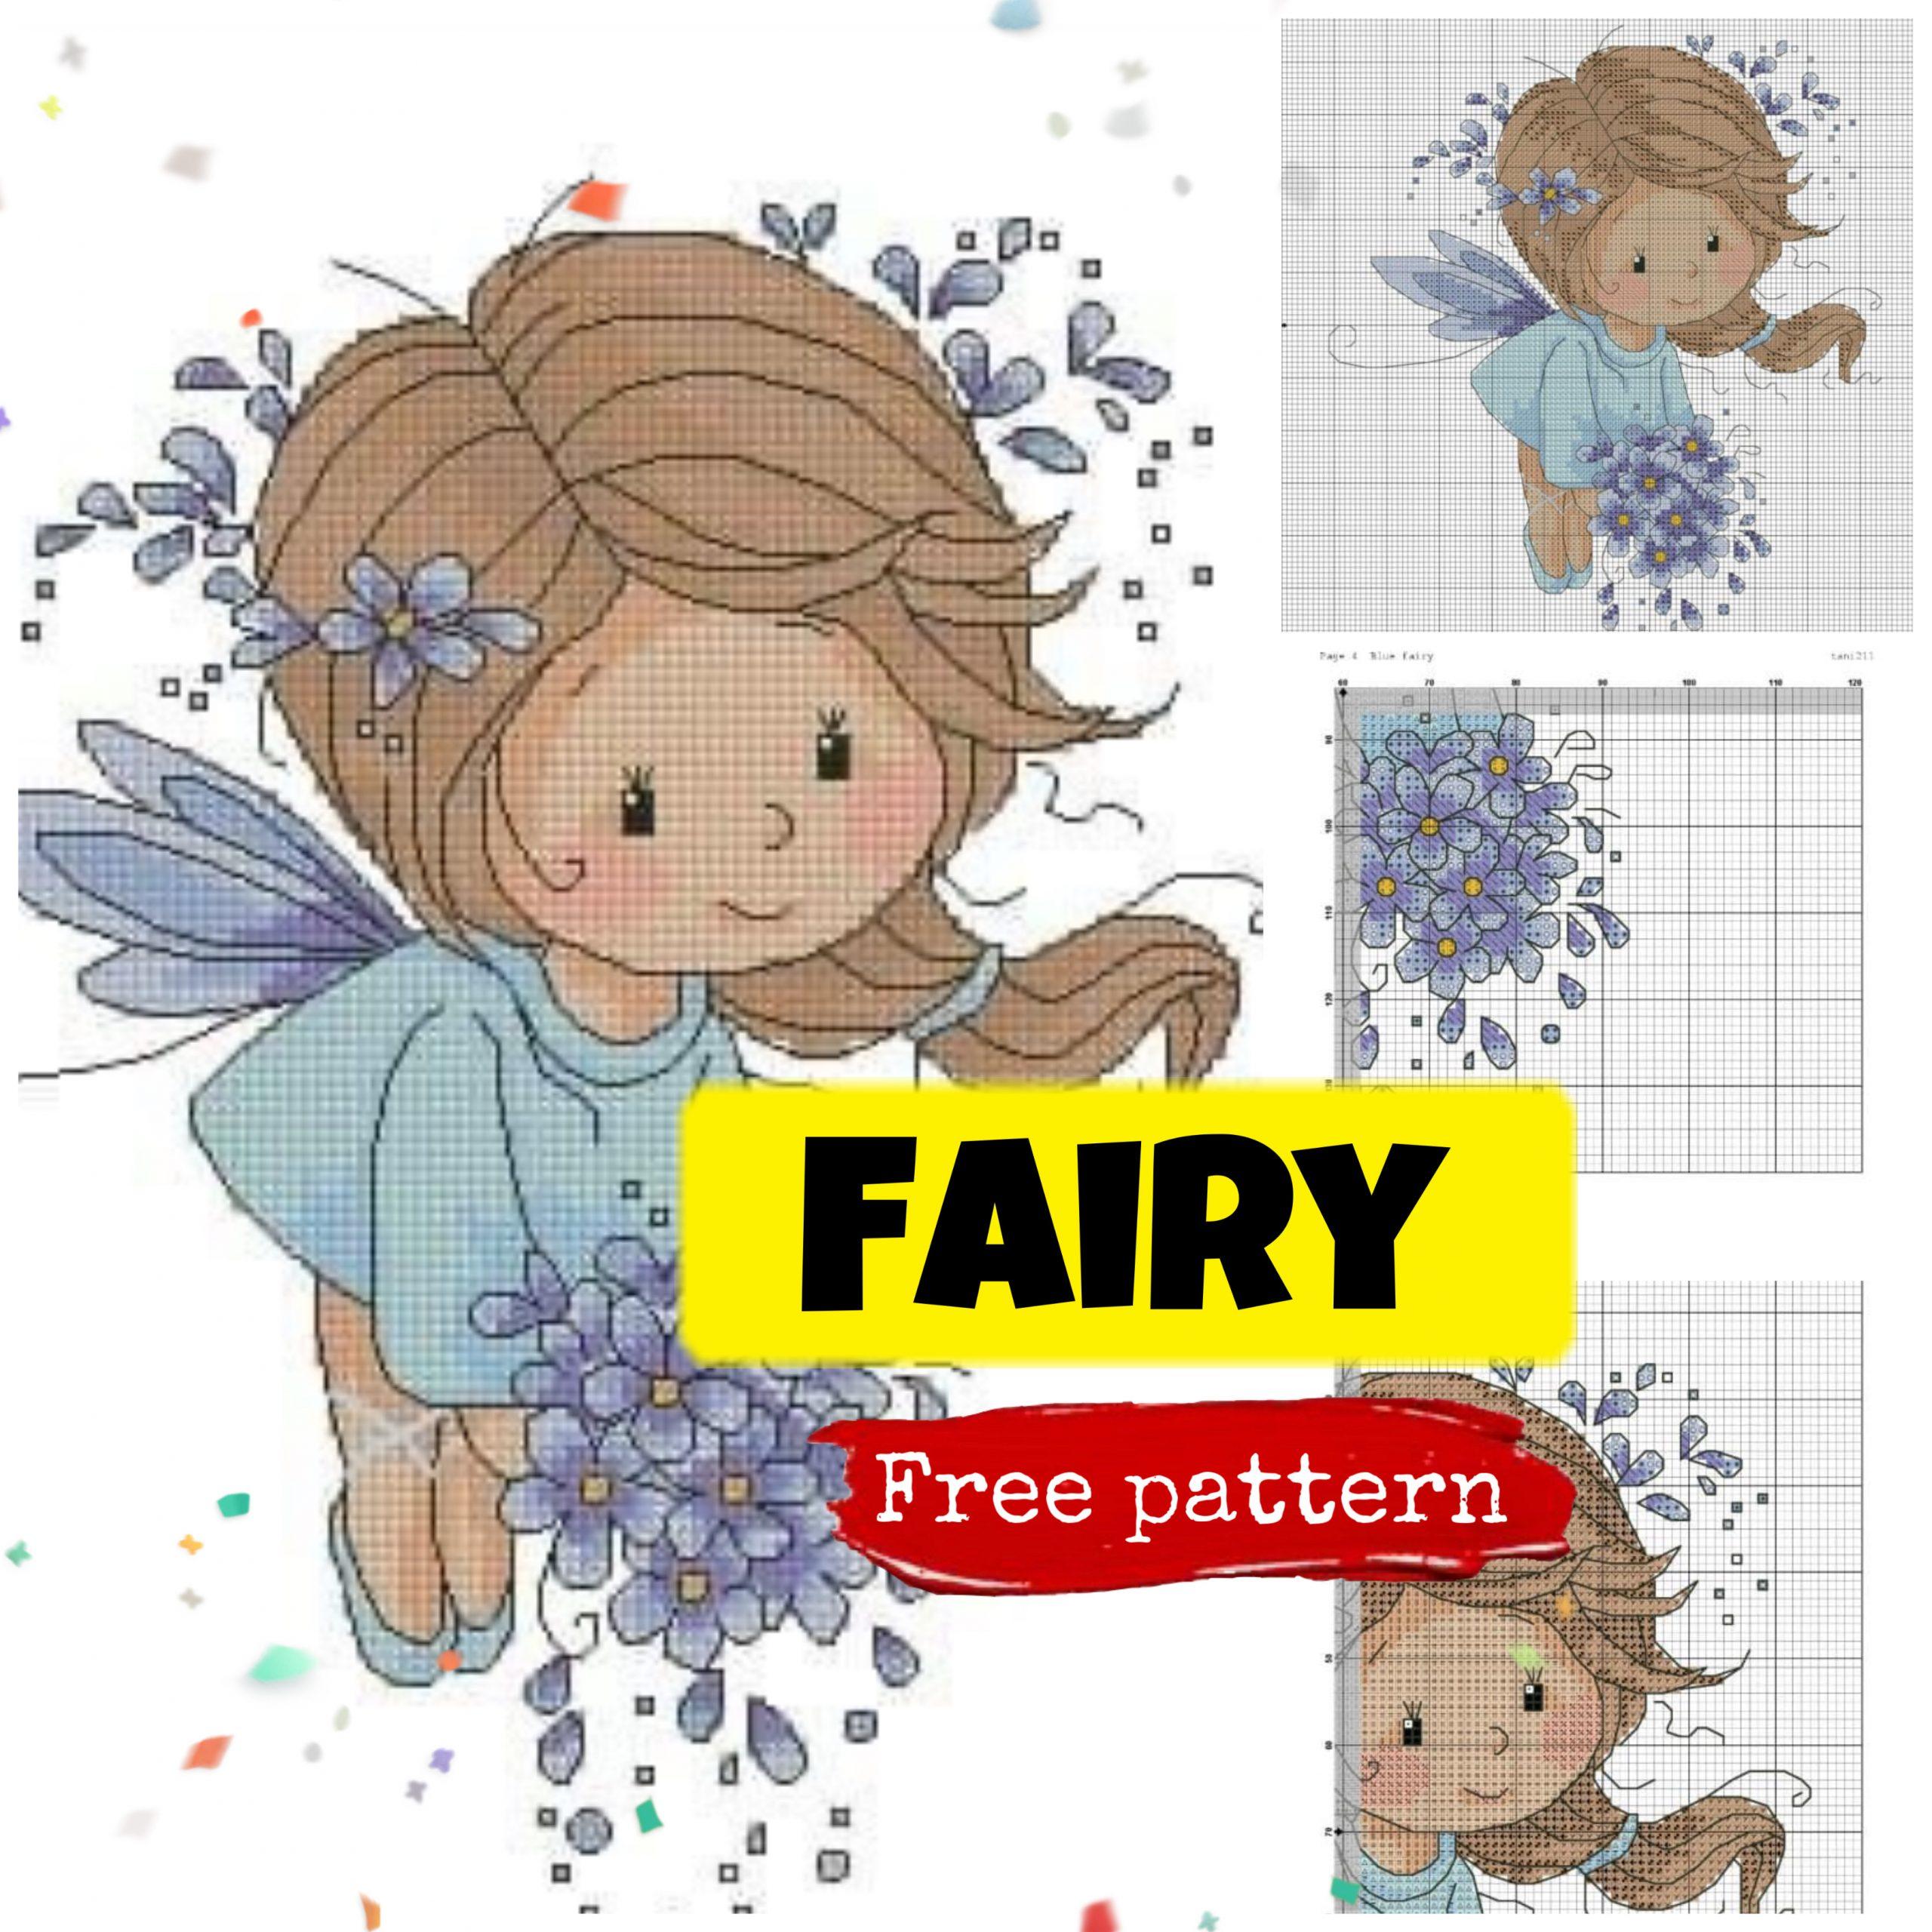 Free Cross Stitch Pattern with Cute Little Fairy